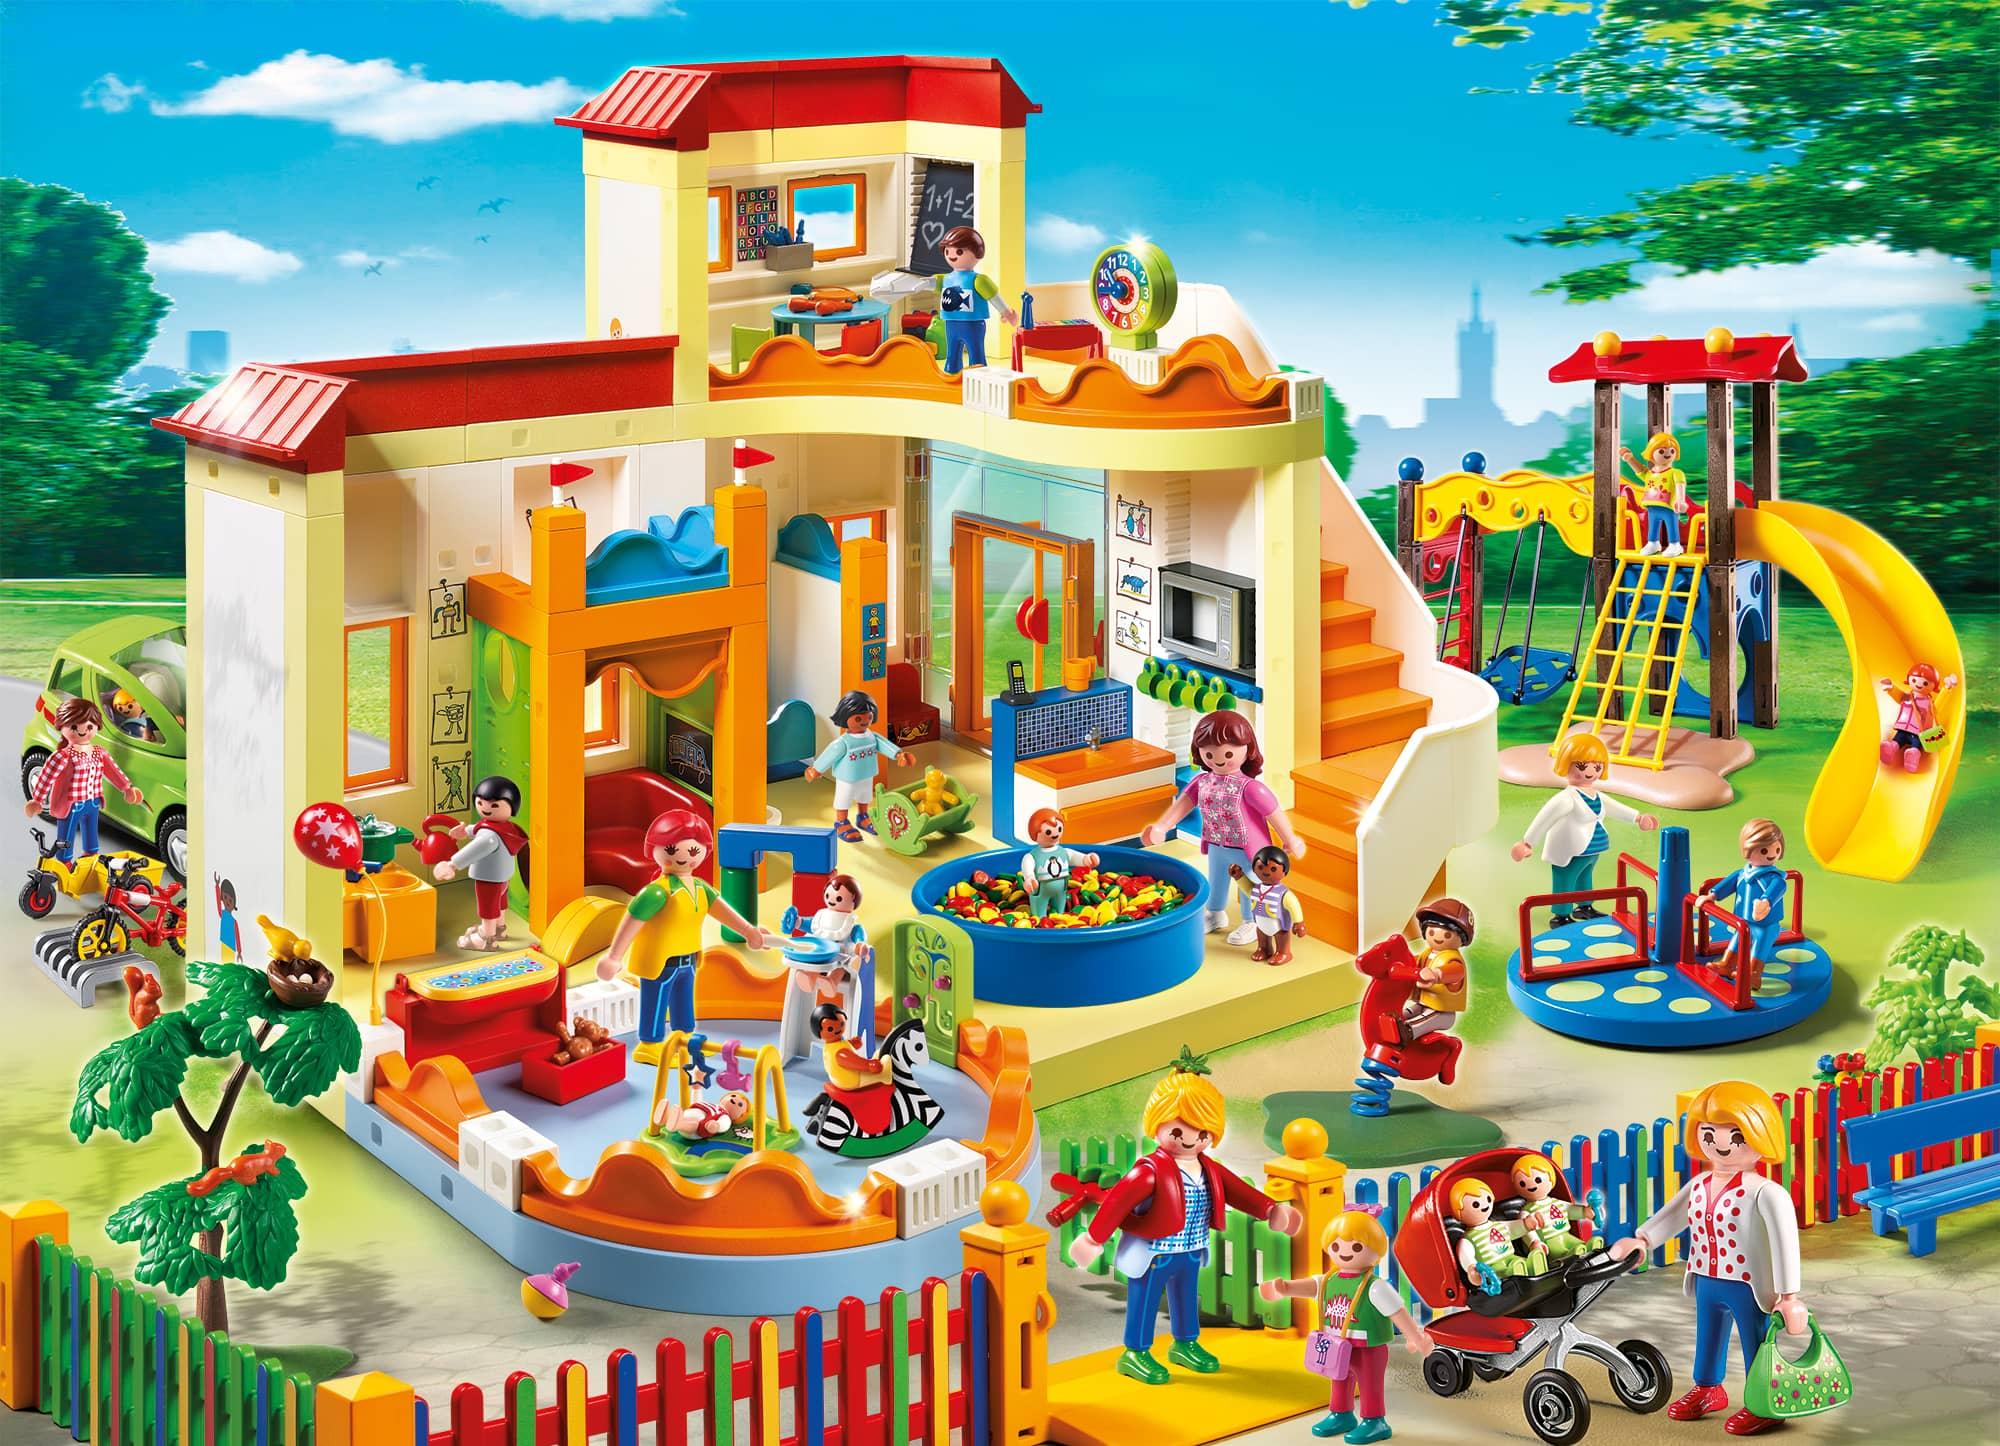 playmobil 5573 zwillingskinderwagen playmobil city. Black Bedroom Furniture Sets. Home Design Ideas